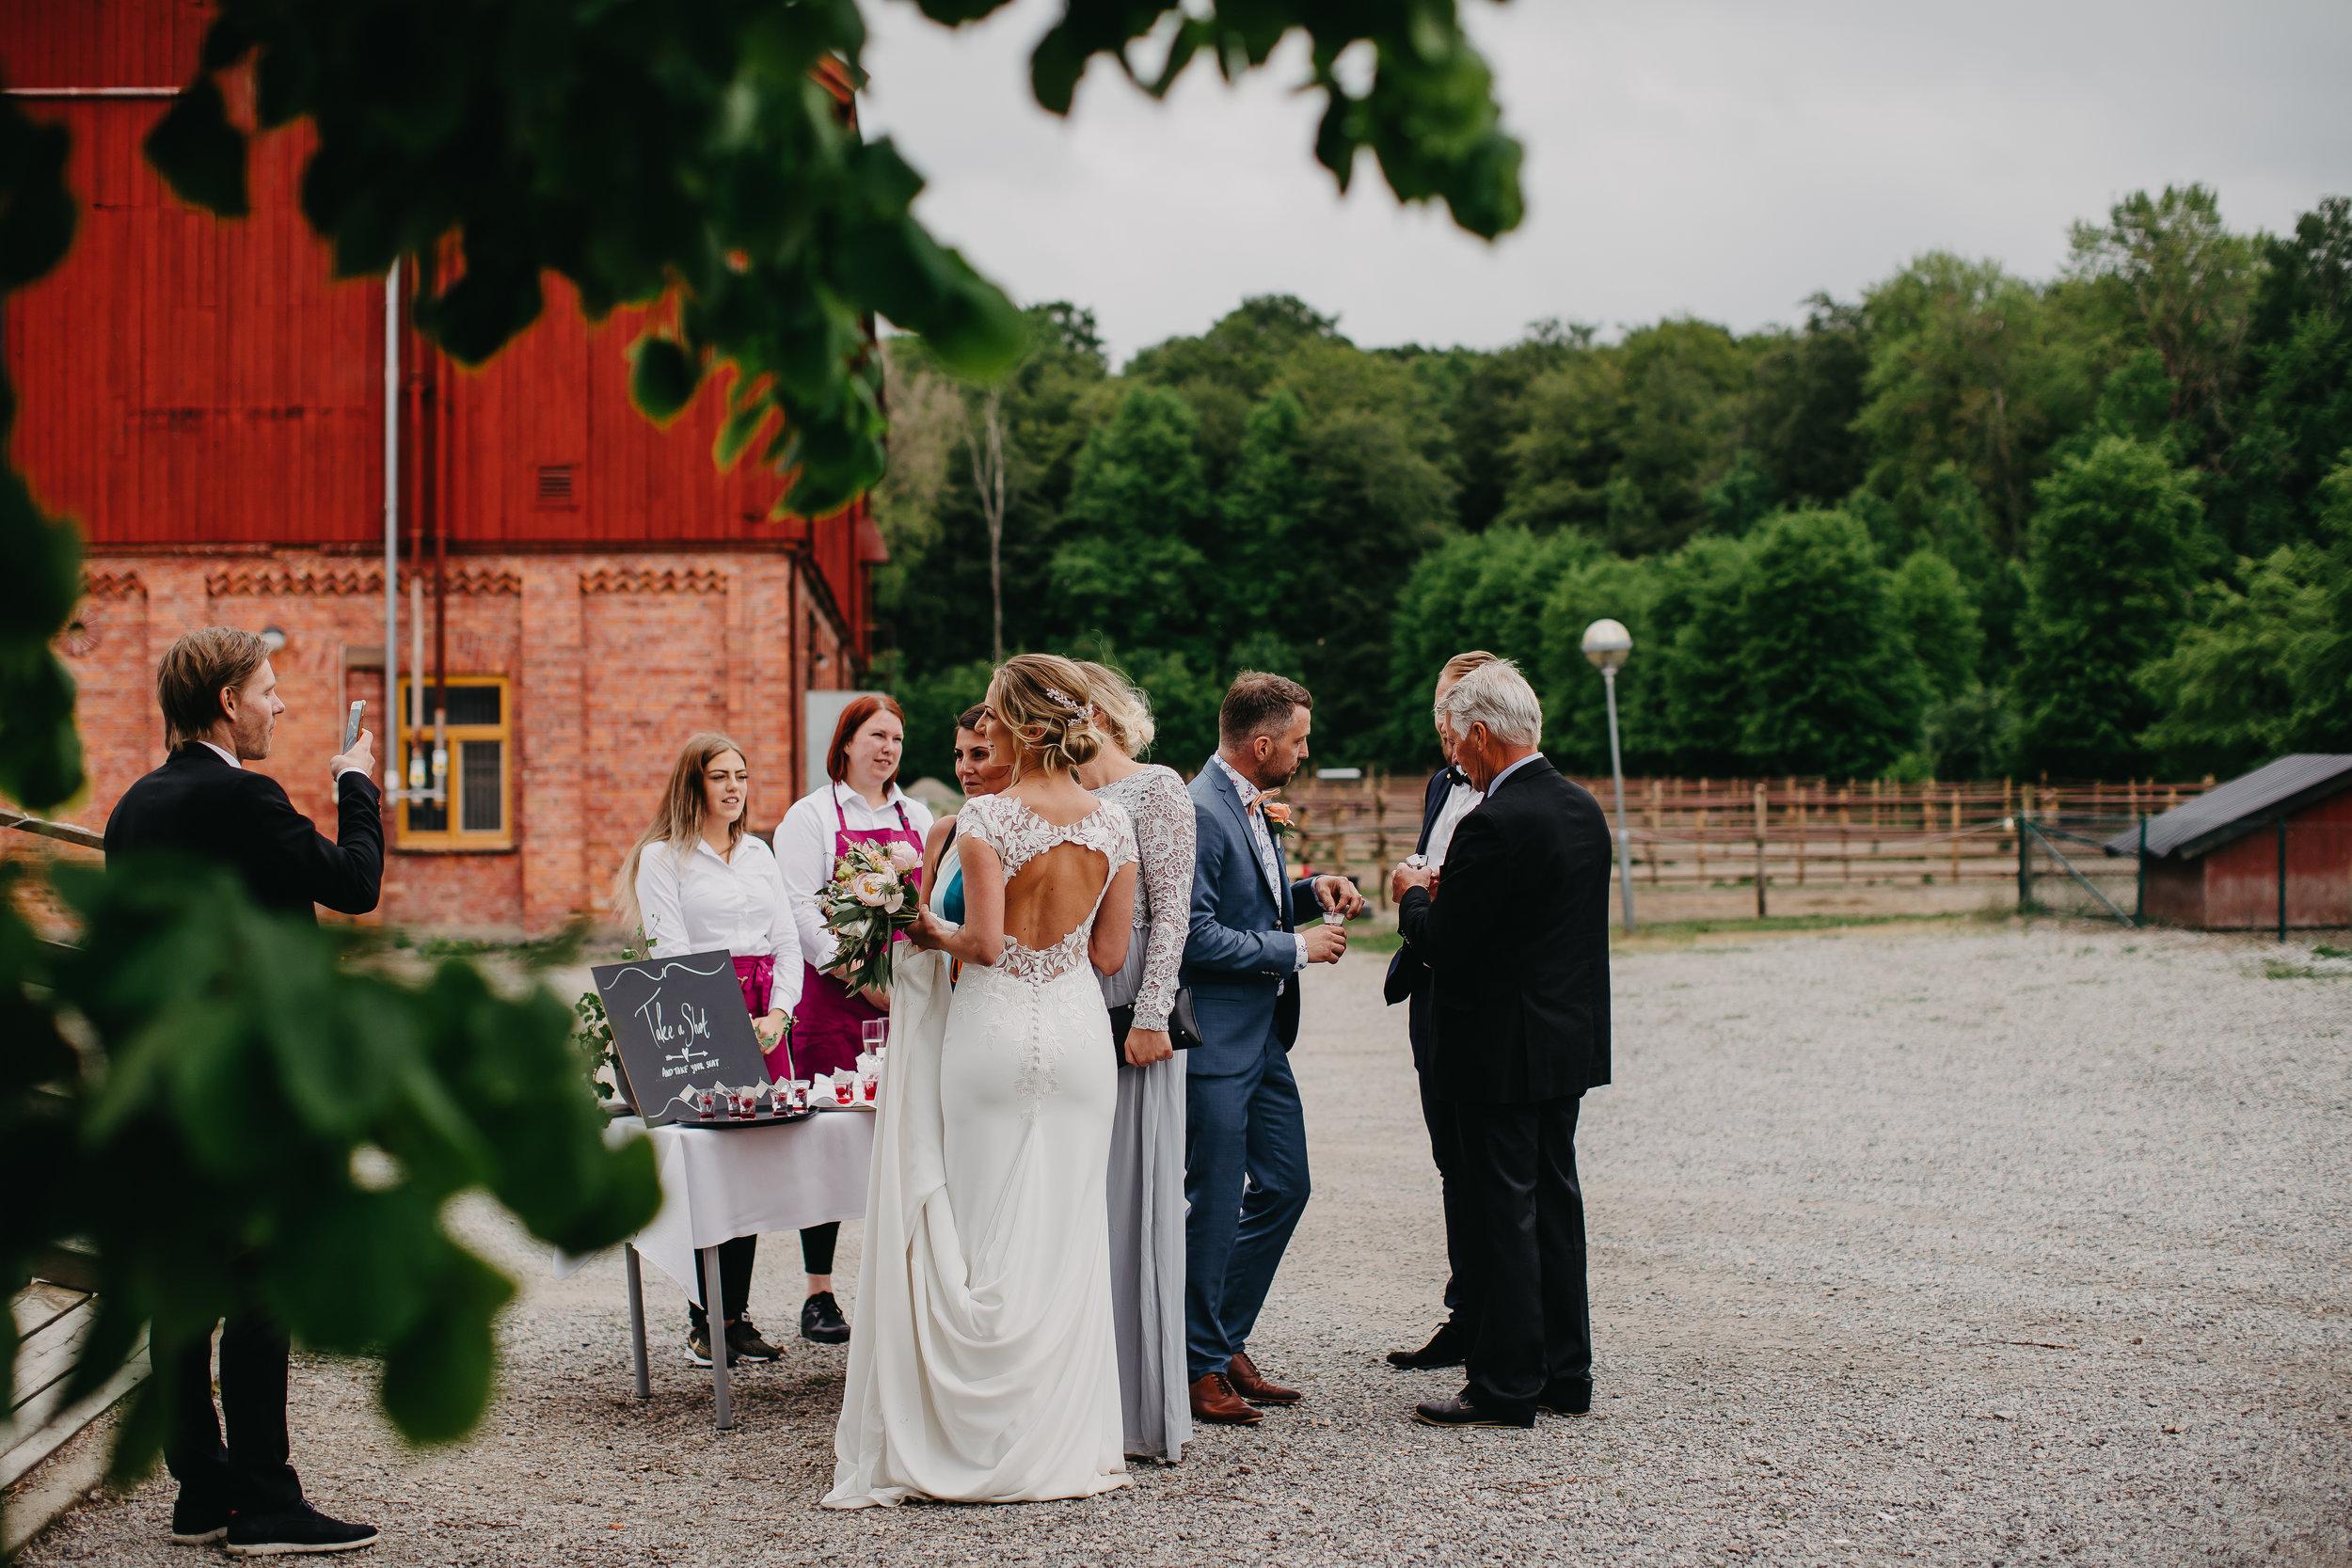 1 Juni 2019 Anna & Simon Bröllop Fotograf Nadine Rebecca 410.jpg